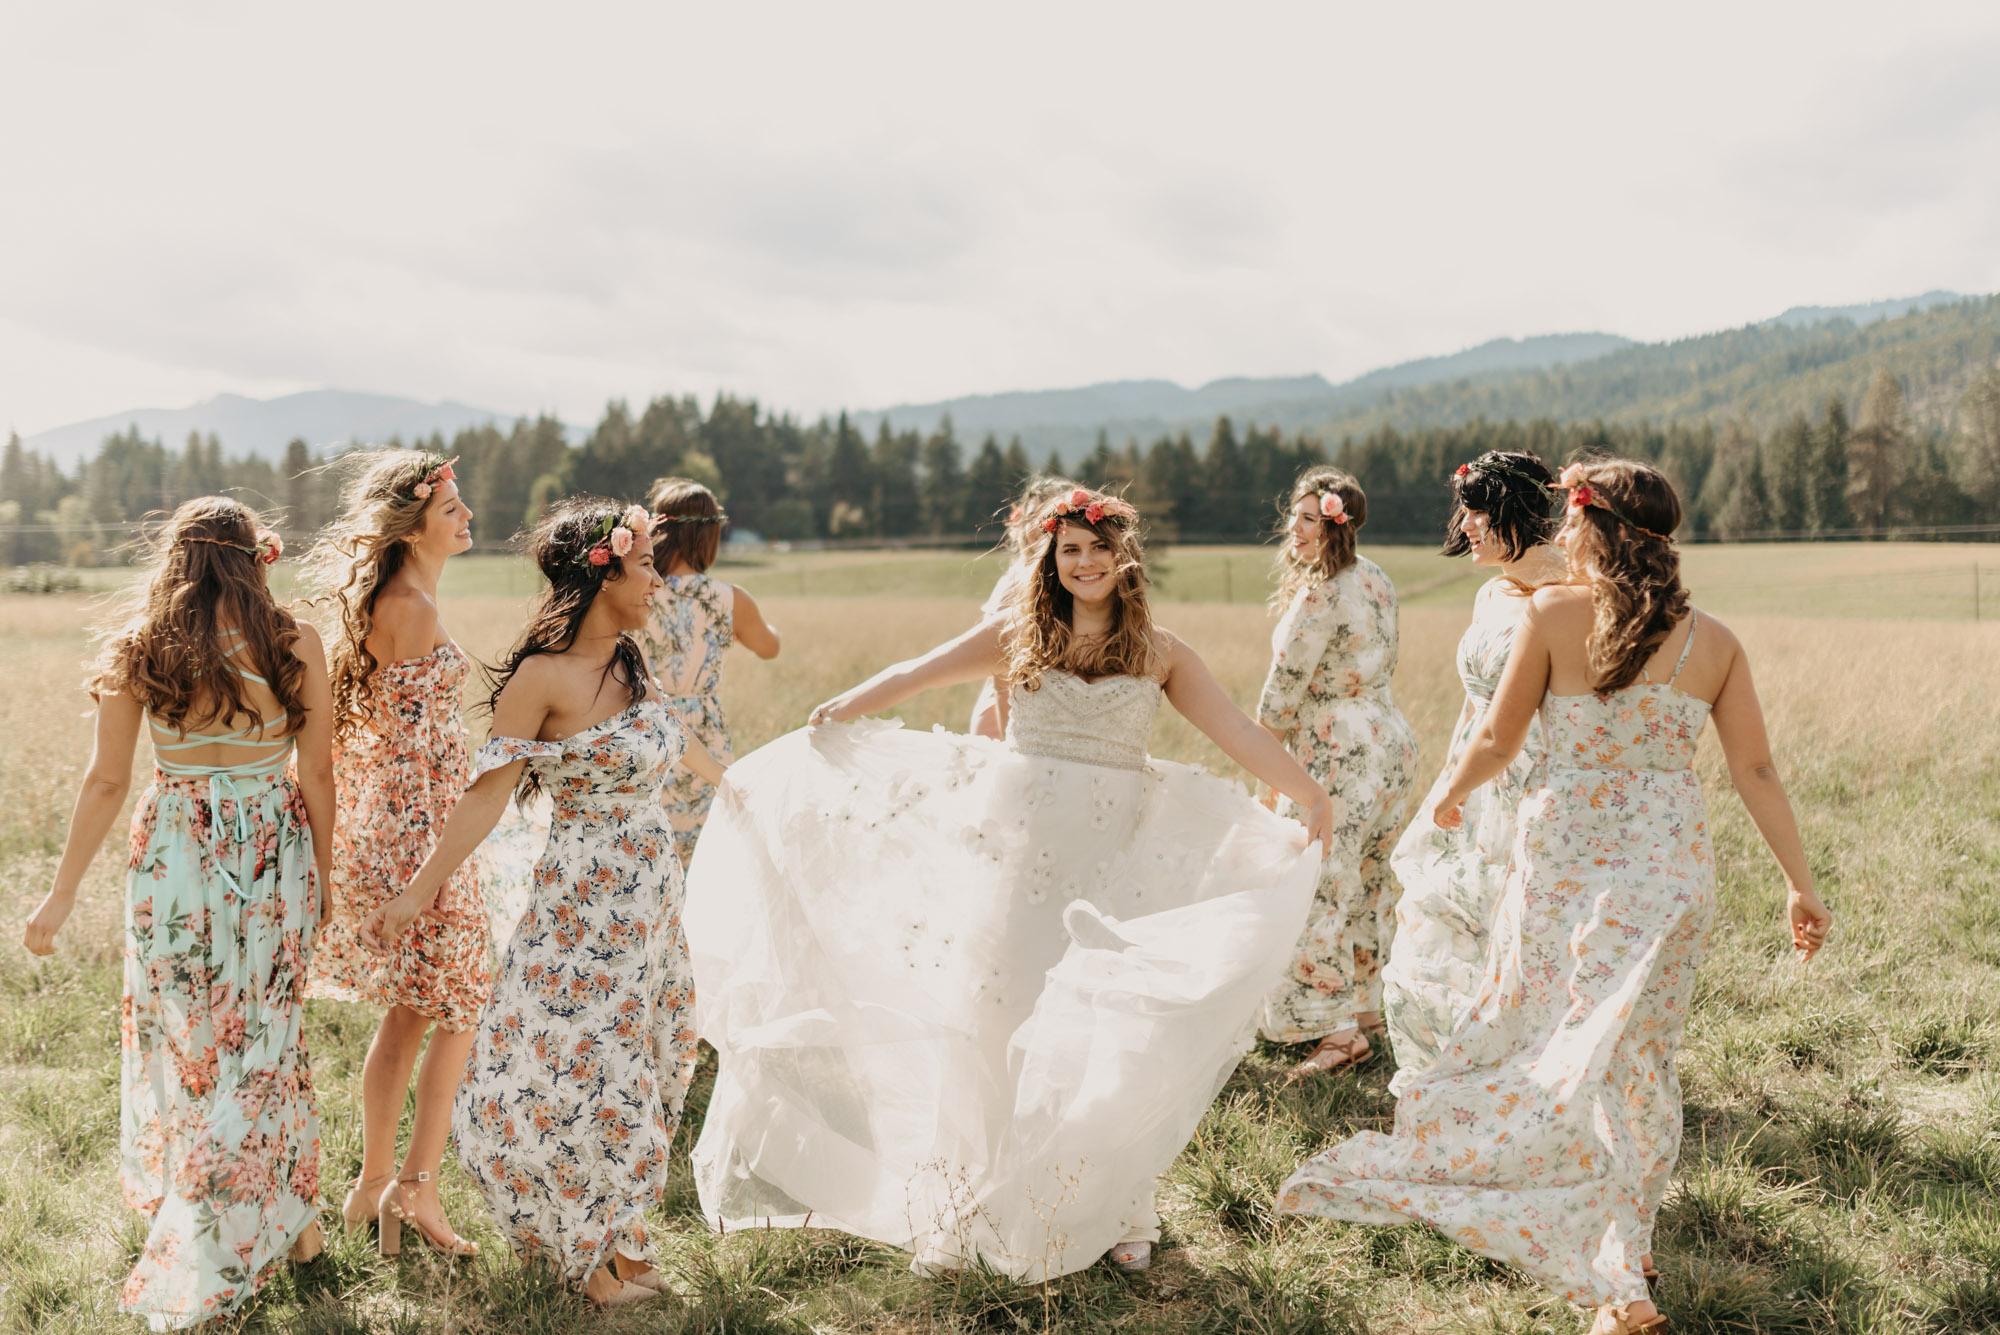 Bridal-Party-Free-People-Flower-Dresses-Washington-Wedding-8554.jpg